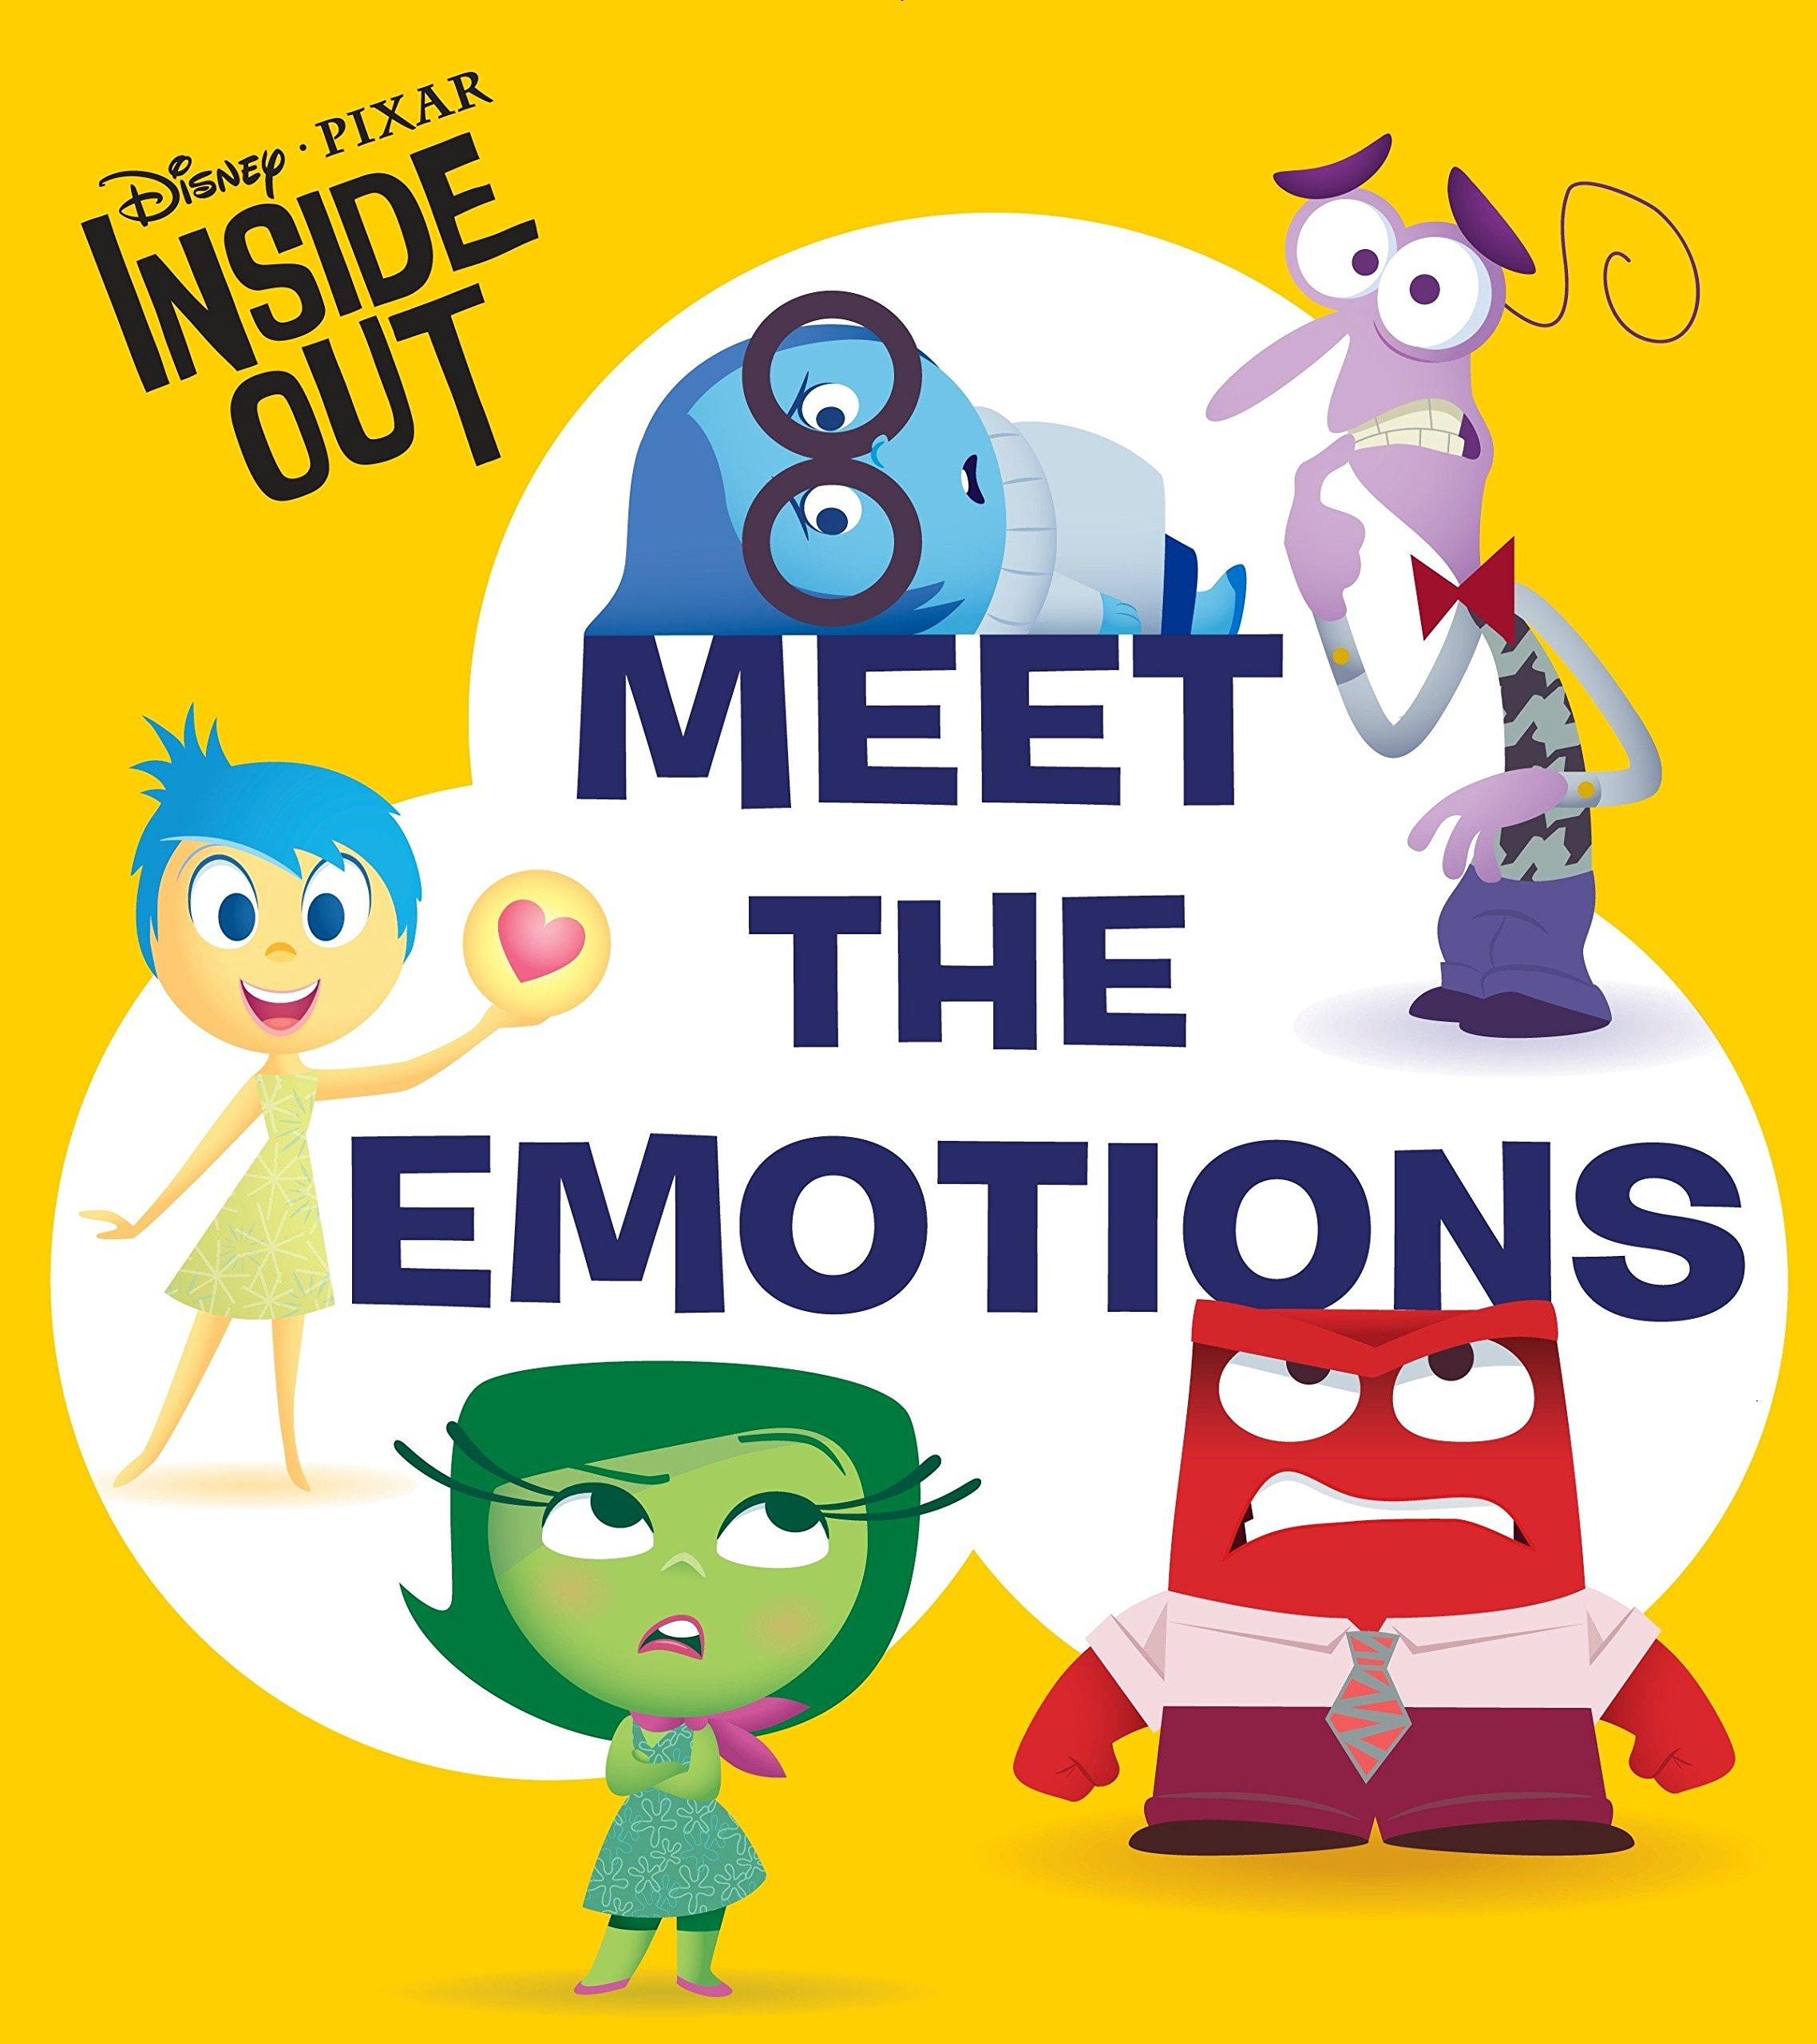 Emotions_Maruyama_DisneyPixar.jpg